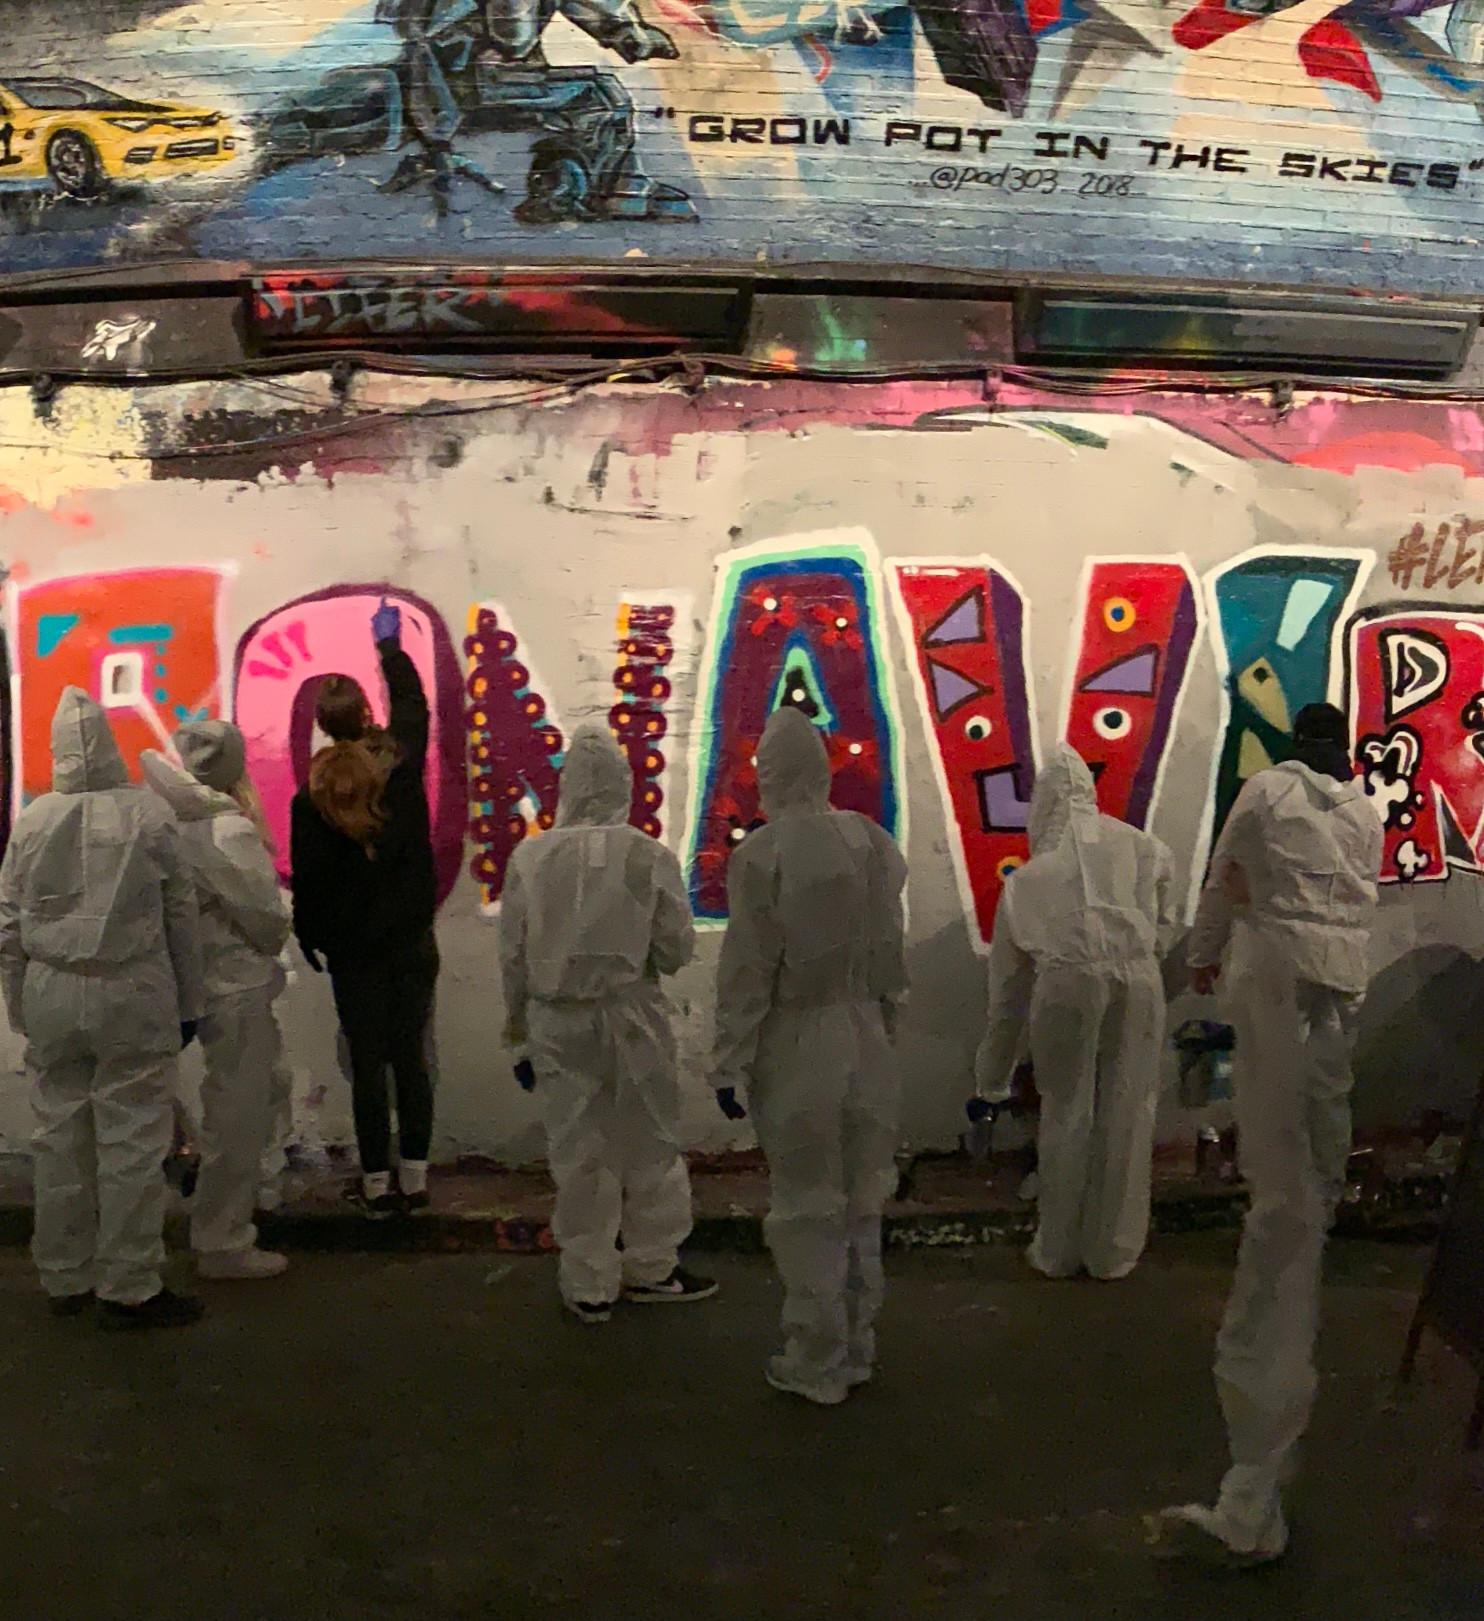 Graffiti workshop 8 people